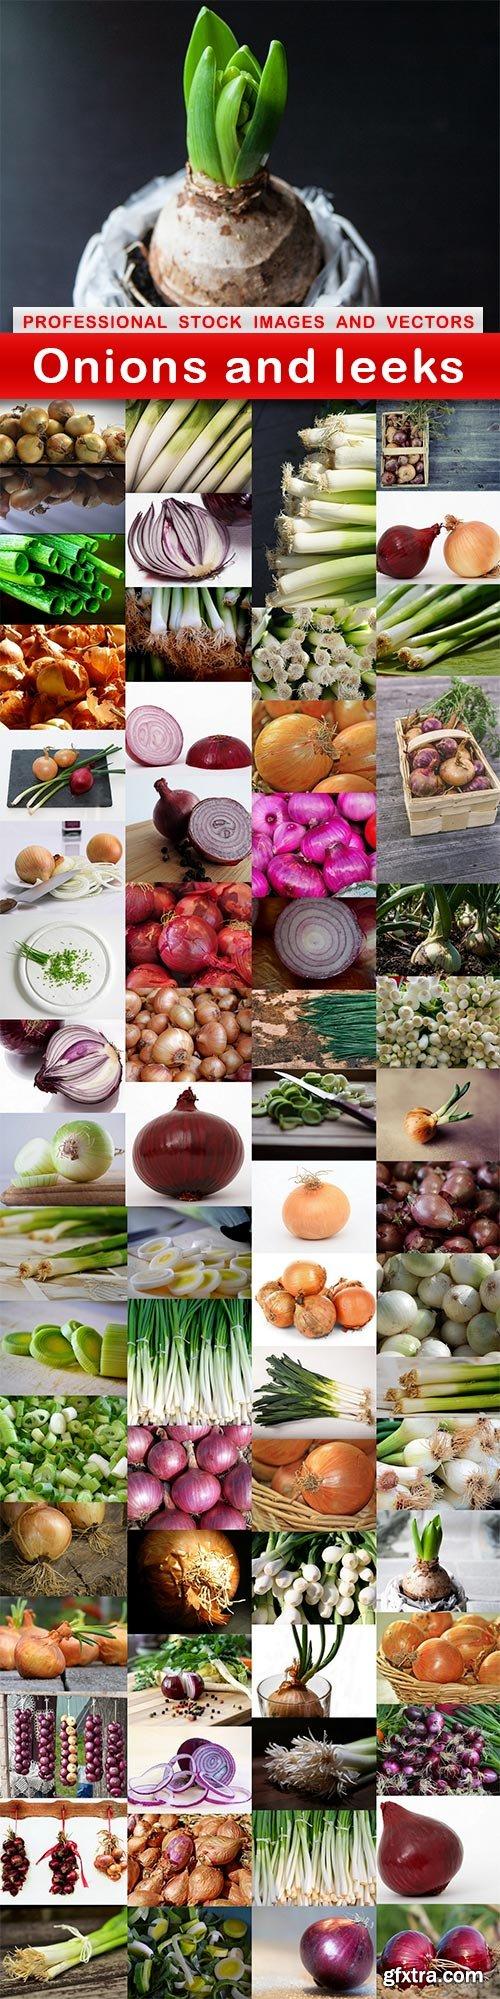 Onions and leeks - 65 UHQ JPEG